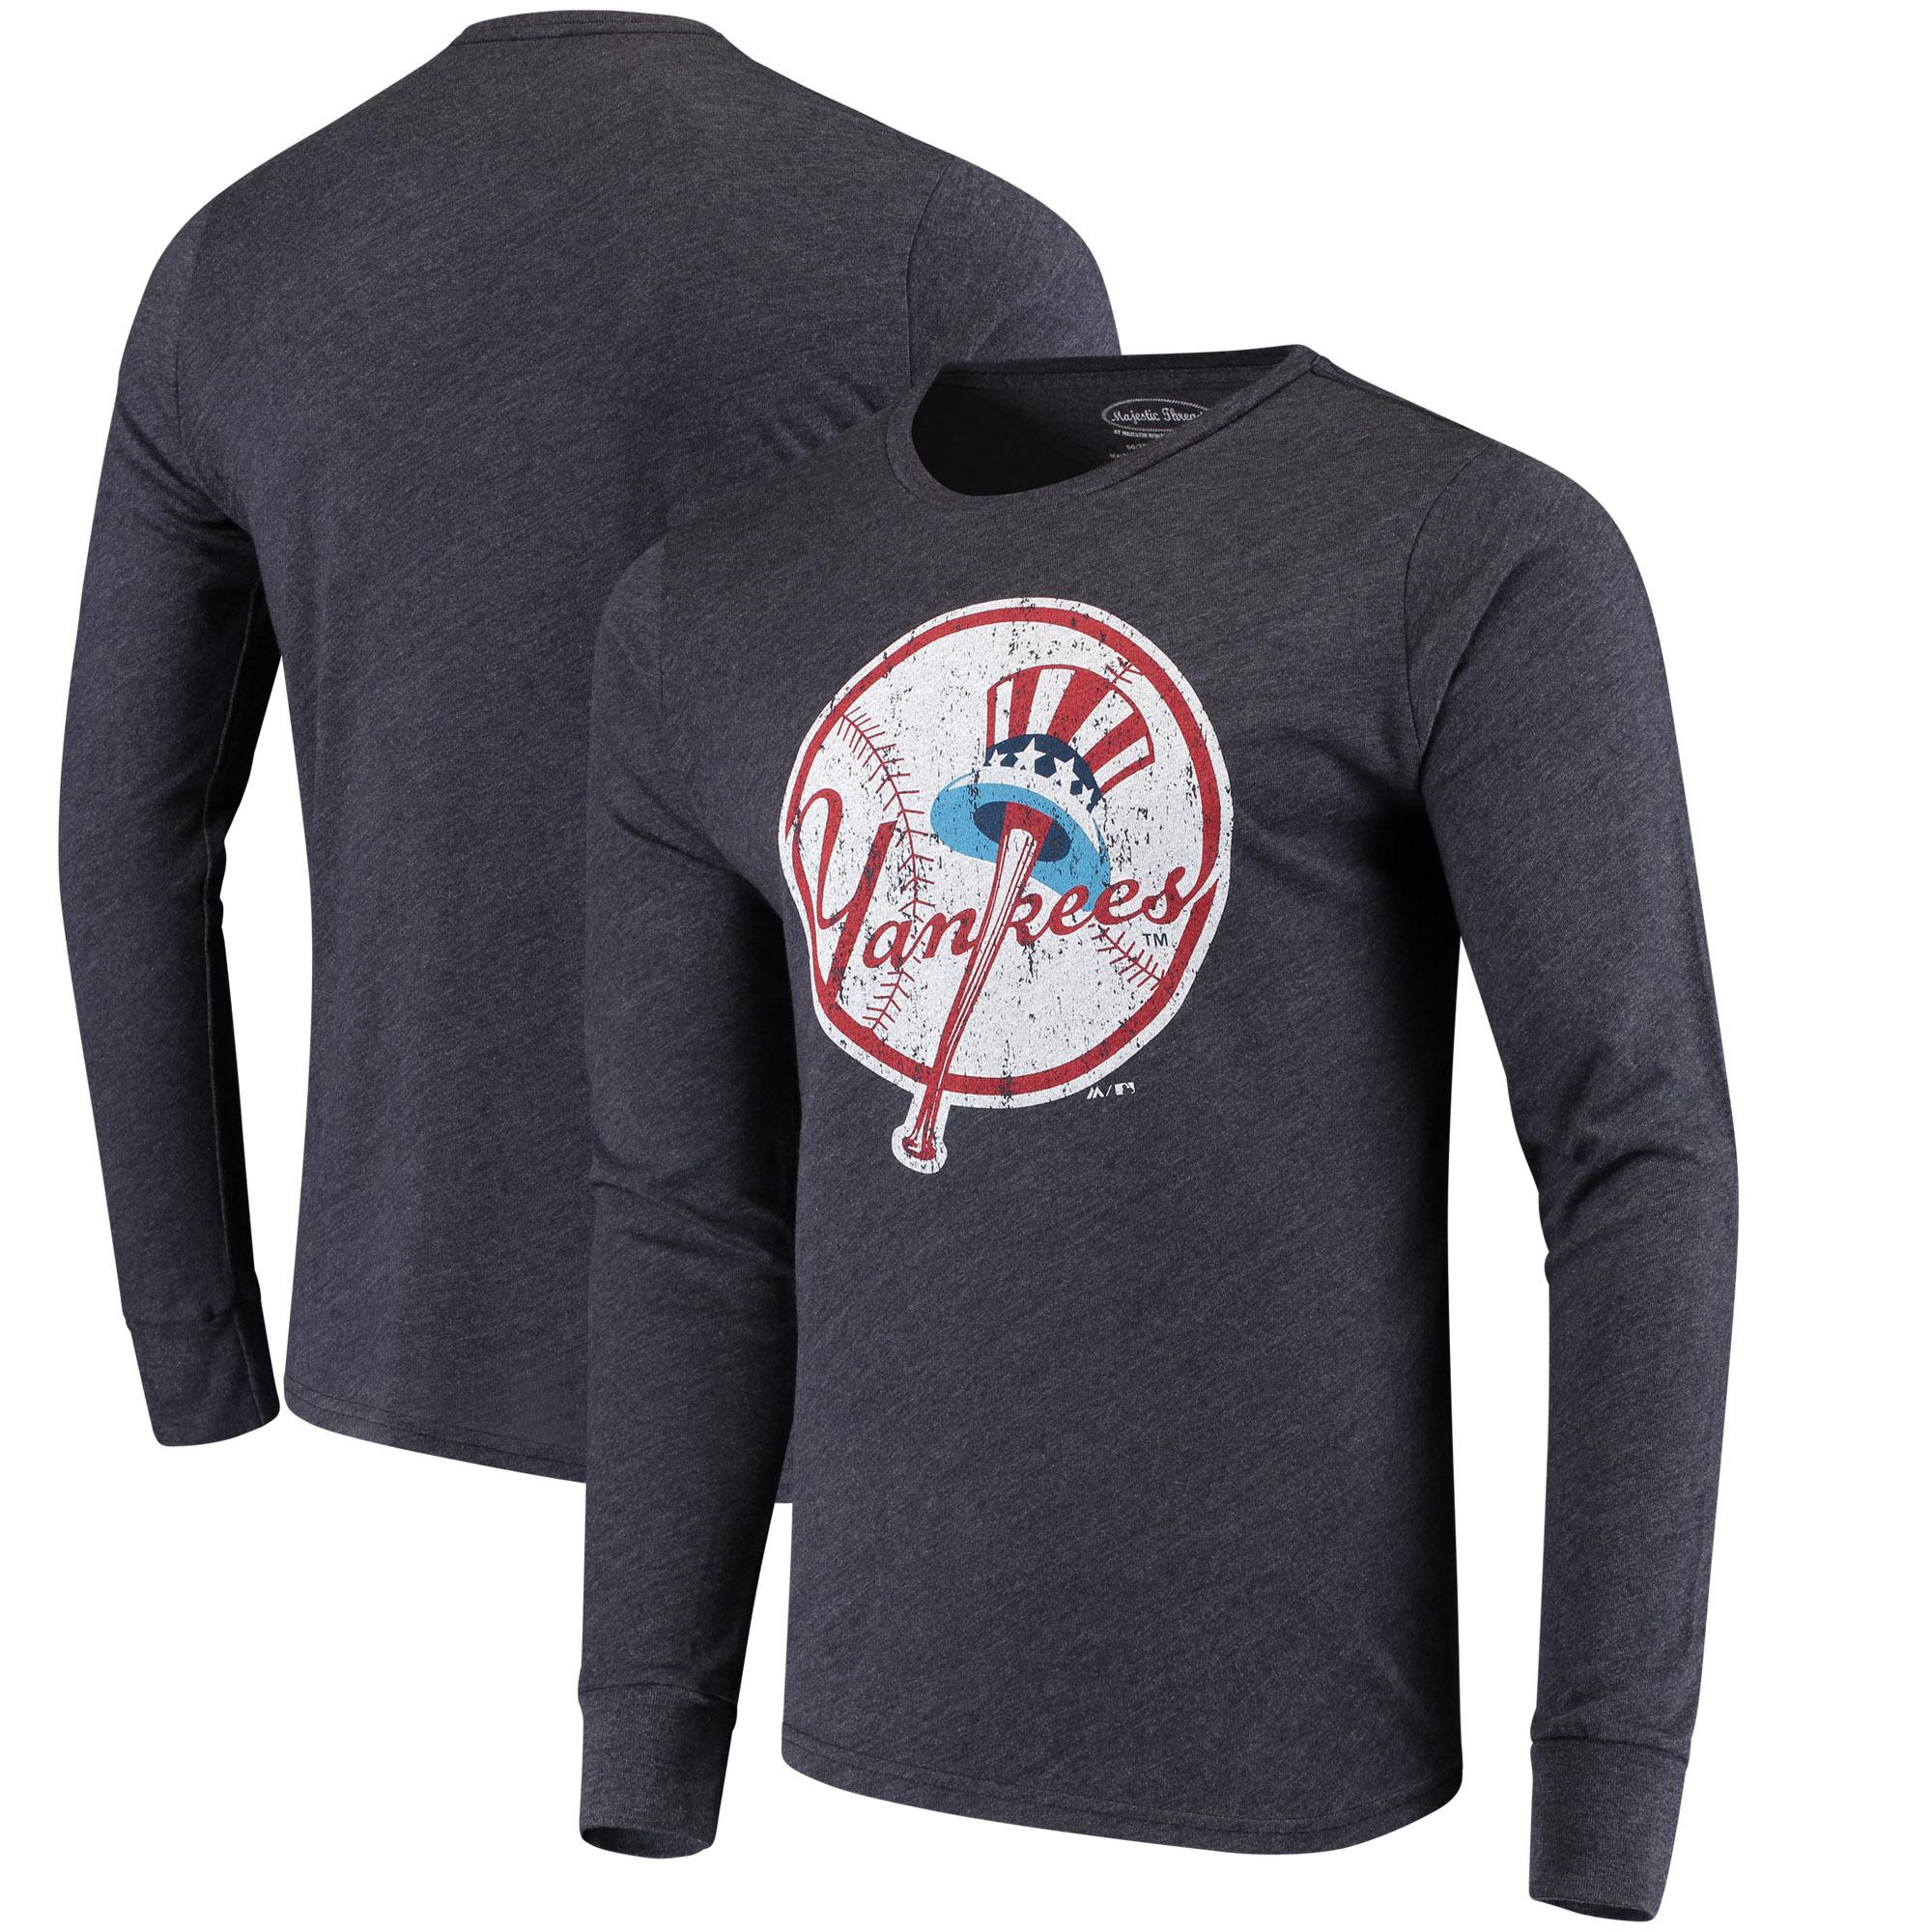 Men's Majestic Threads Heathered Navy New York Yankees Tri-Blend Long Sleeve T-Shirt